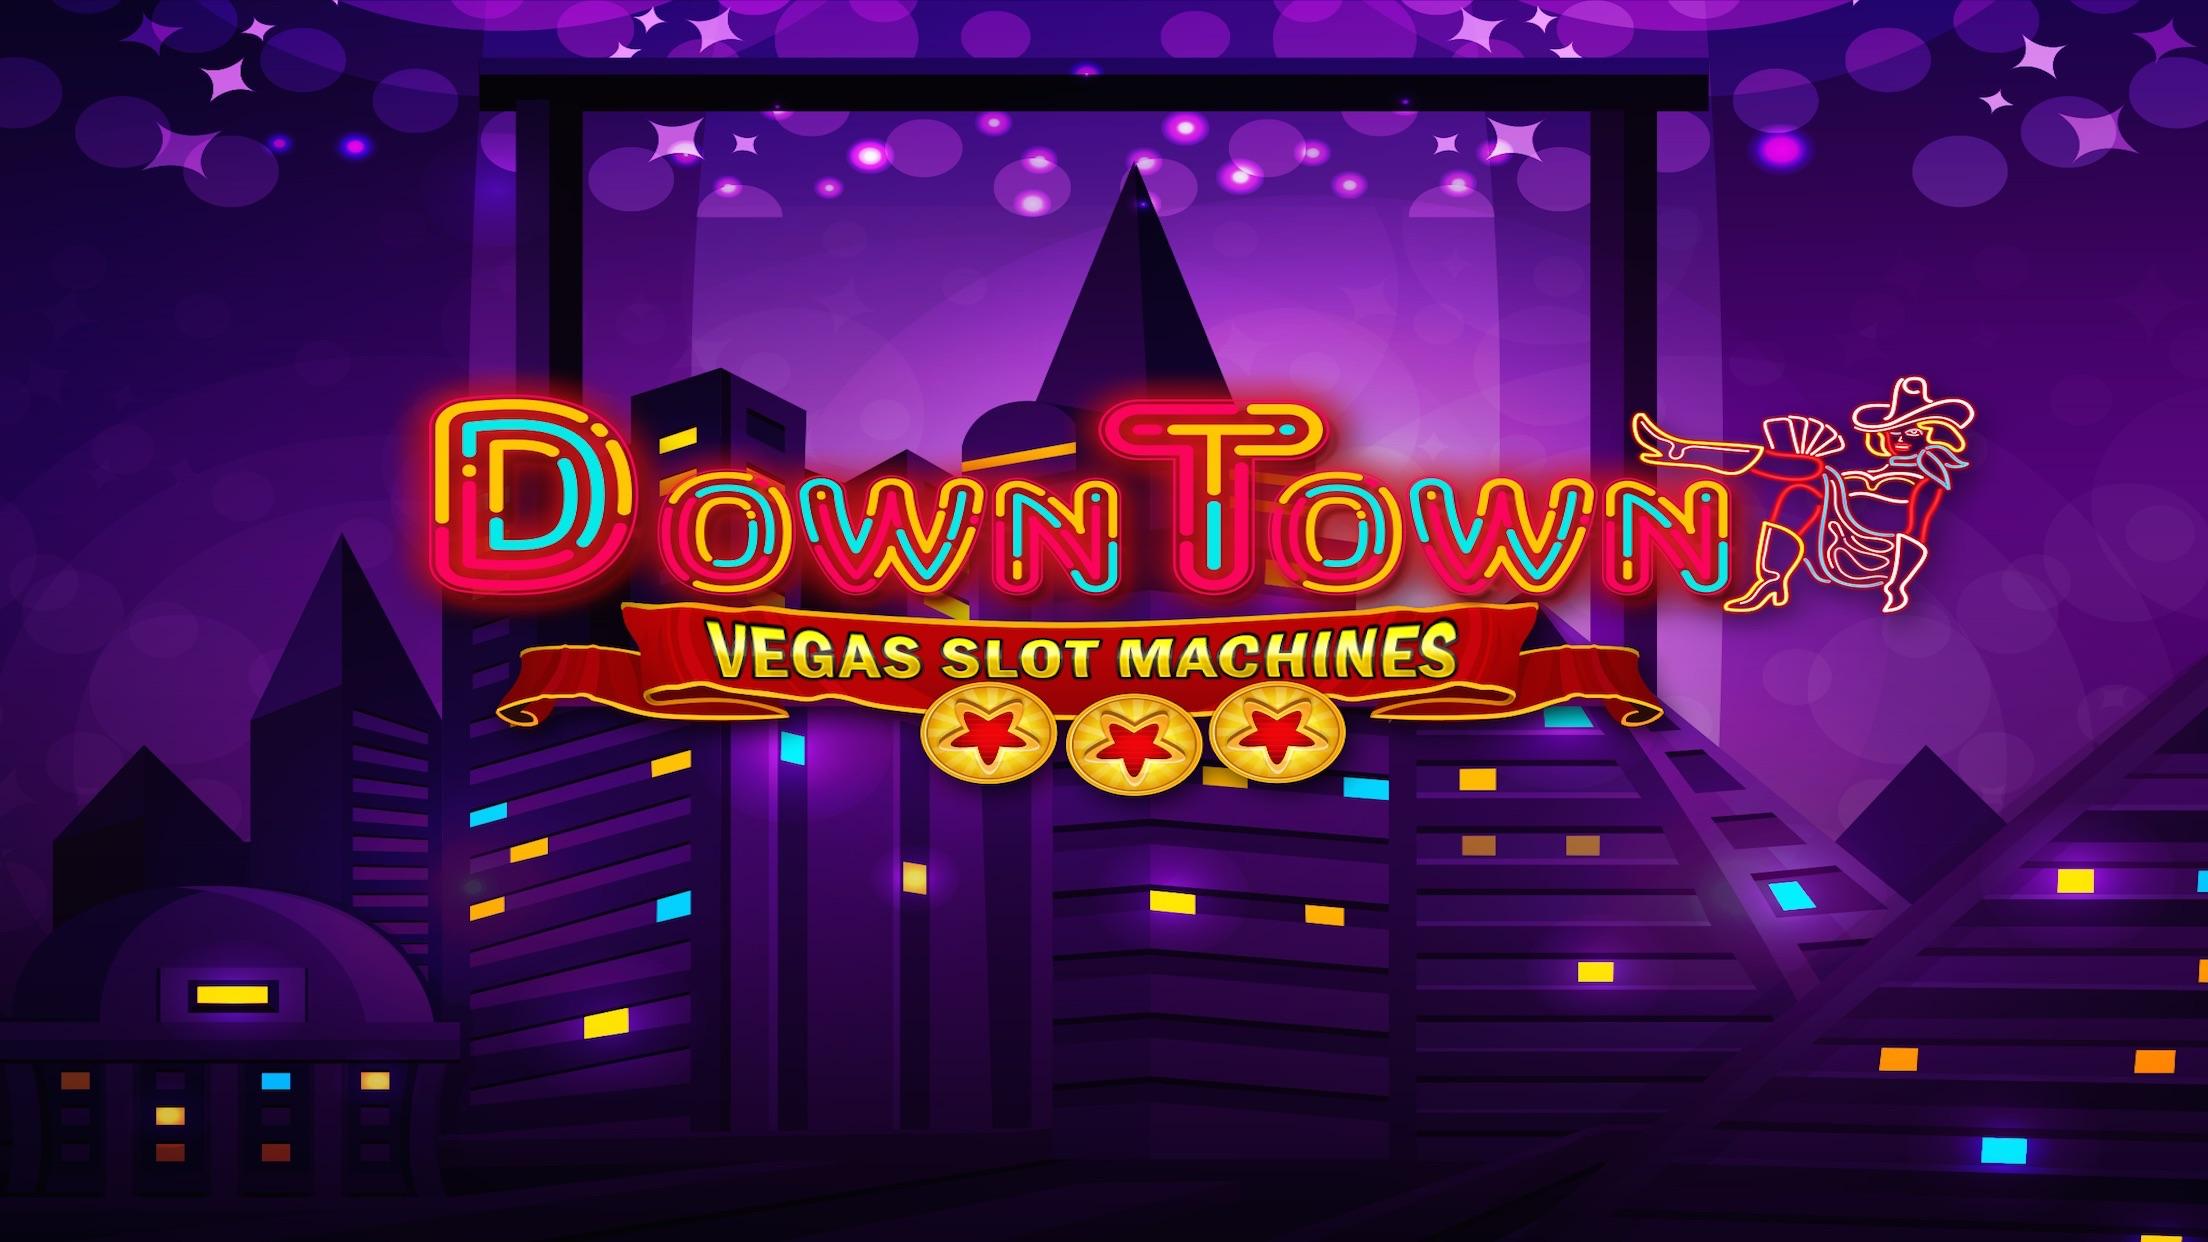 Casino Games - Downtown Vegas Slot Machines Screenshot